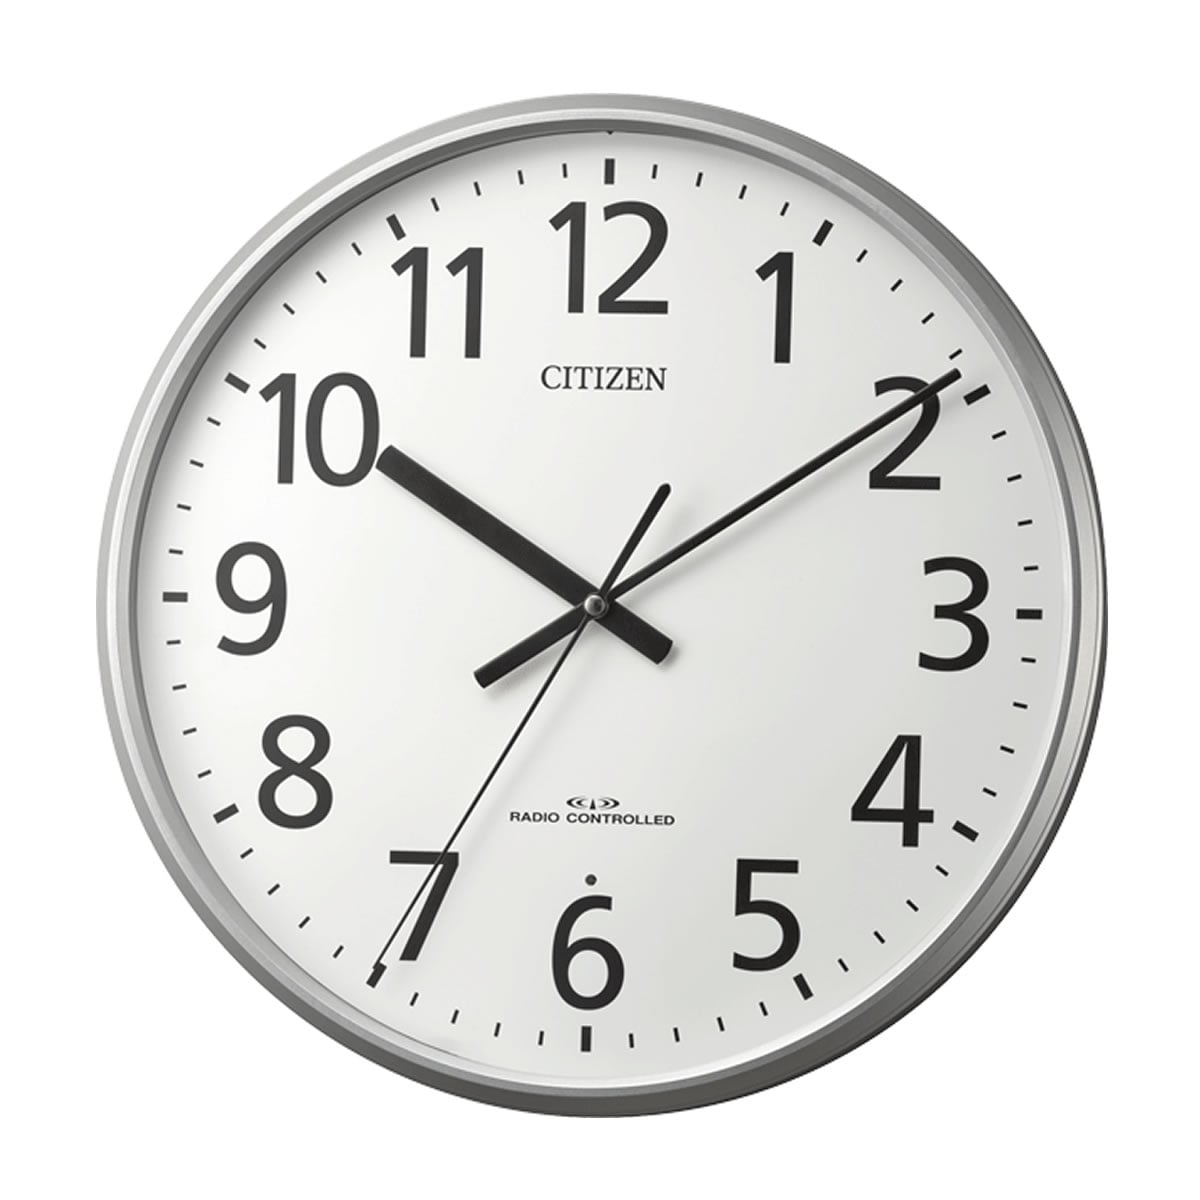 CITIZEN シチズン オフィスタイプ 電波掛け時計【8MYA39-019】